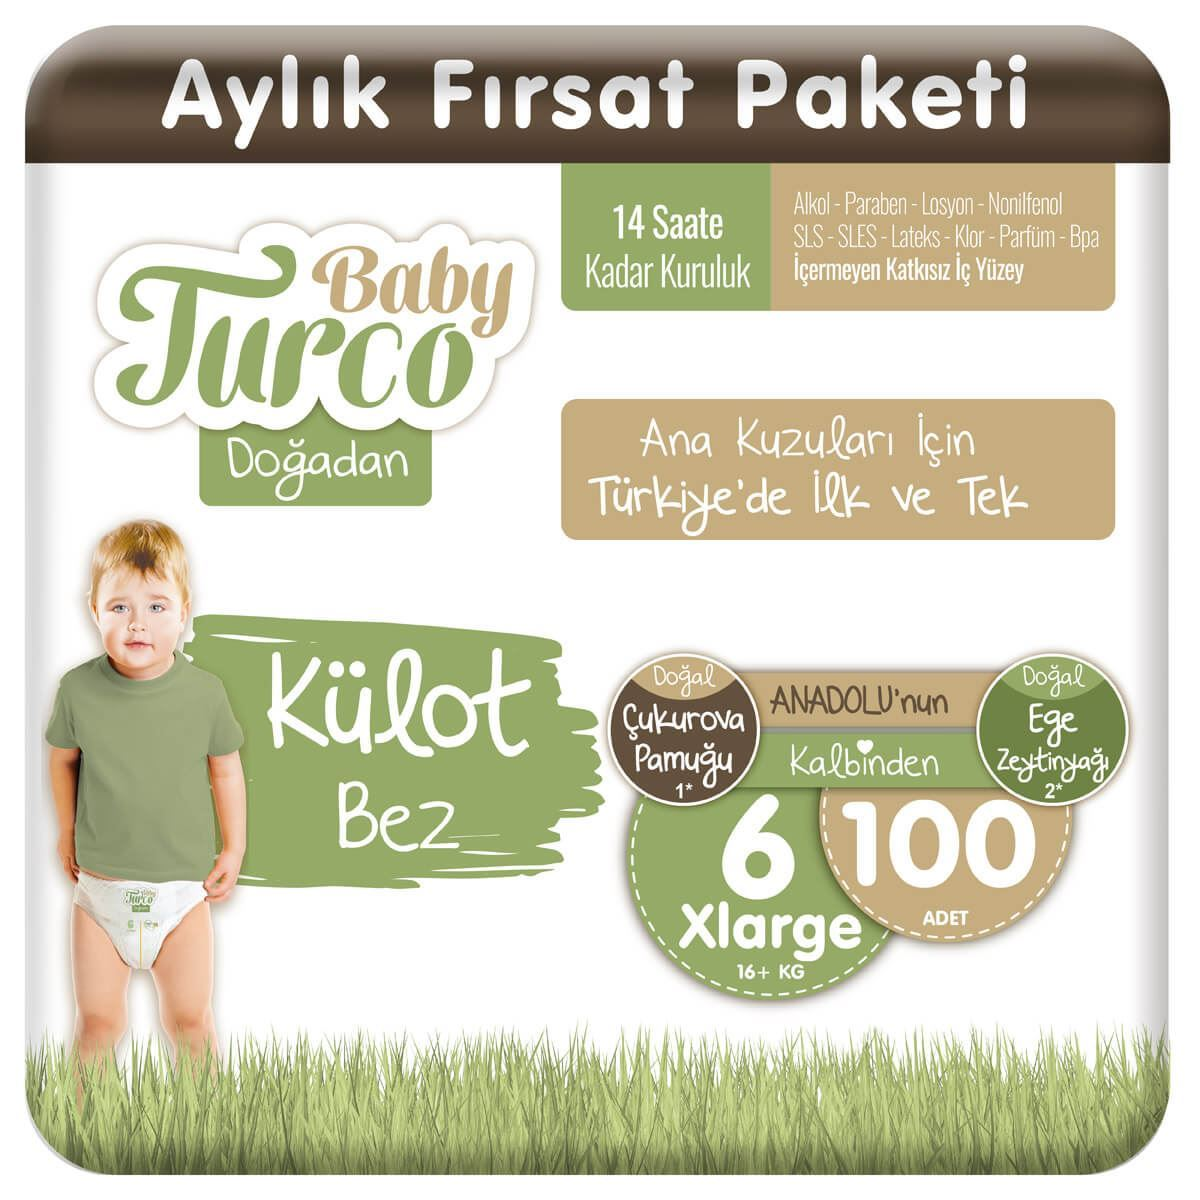 Baby Turco Doğadan Külot Bez 6 Numara Xlarge 100 Adet